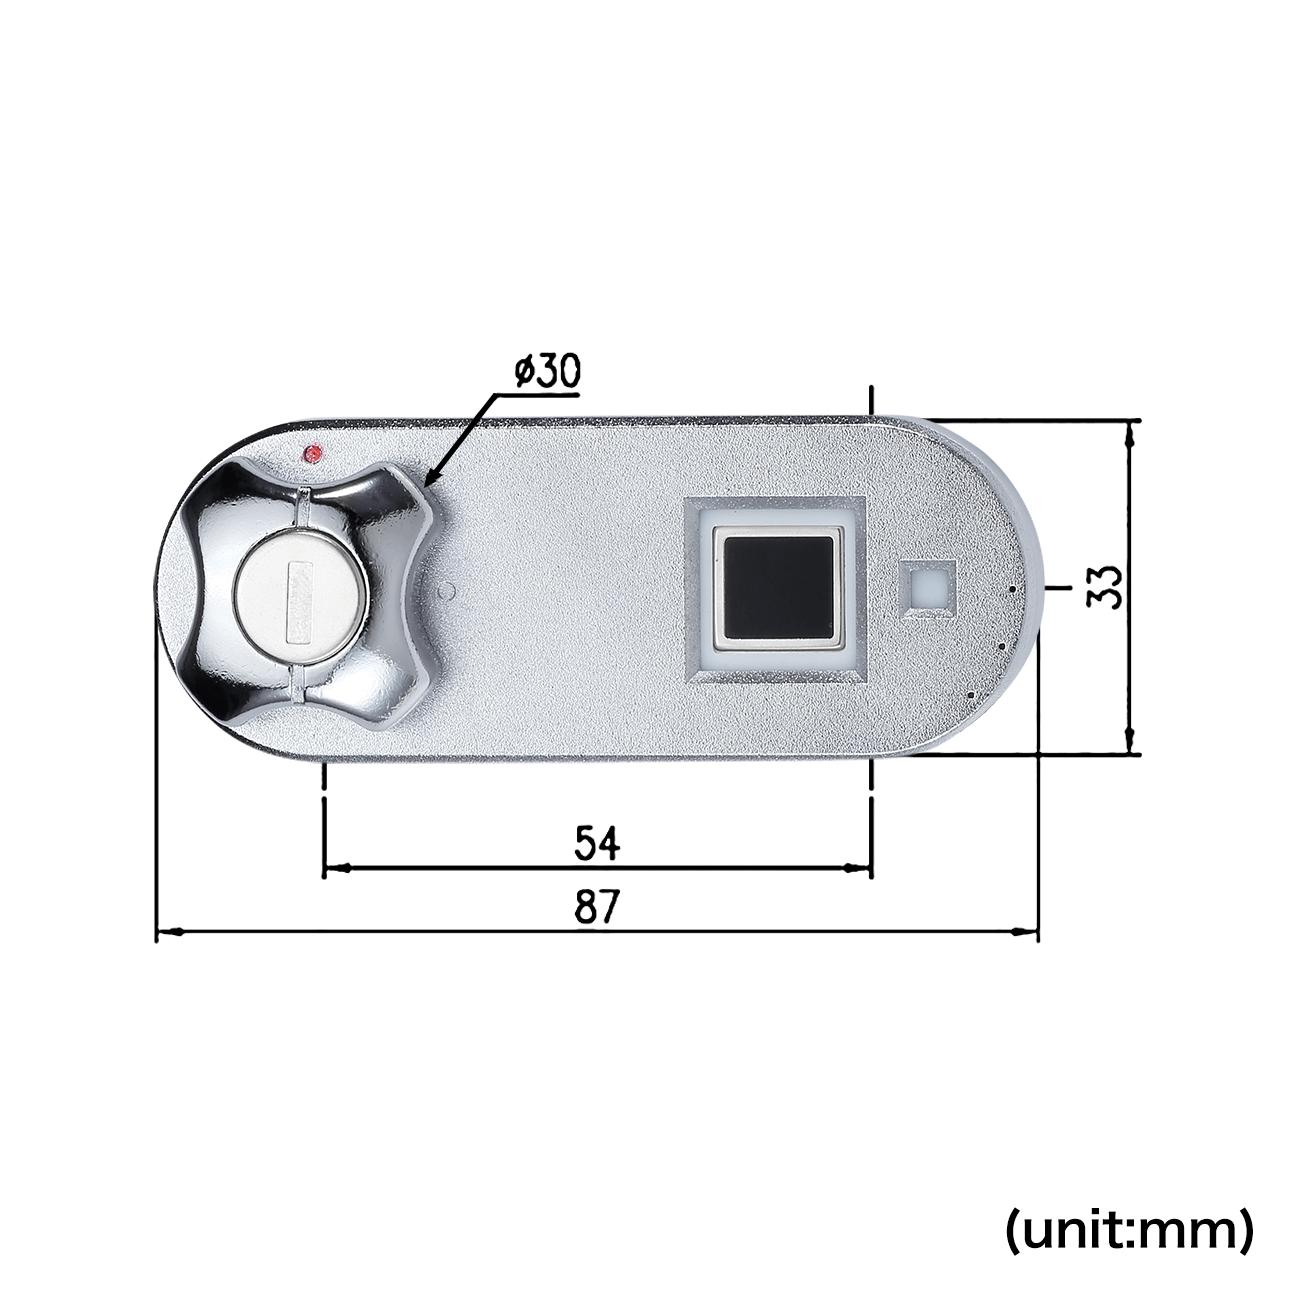 Cabinet/drawer biometric fingerprint lock - Midas Touch